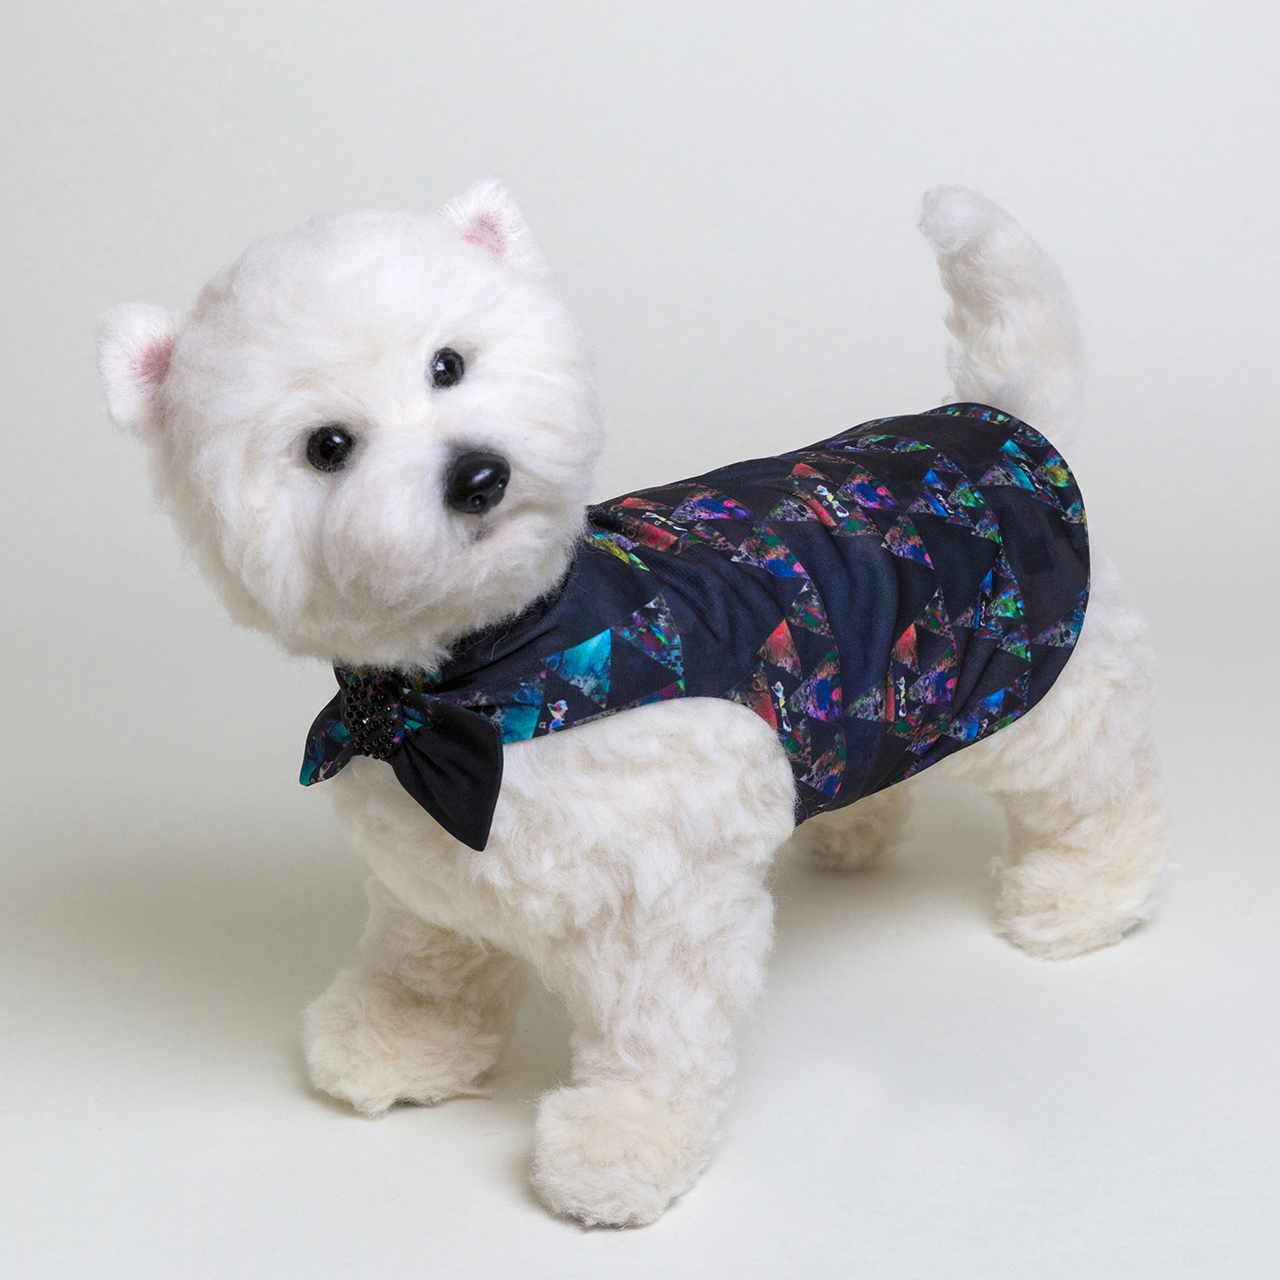 jibun-fuku DOG 【チューブドレスbeads】DOGB201806